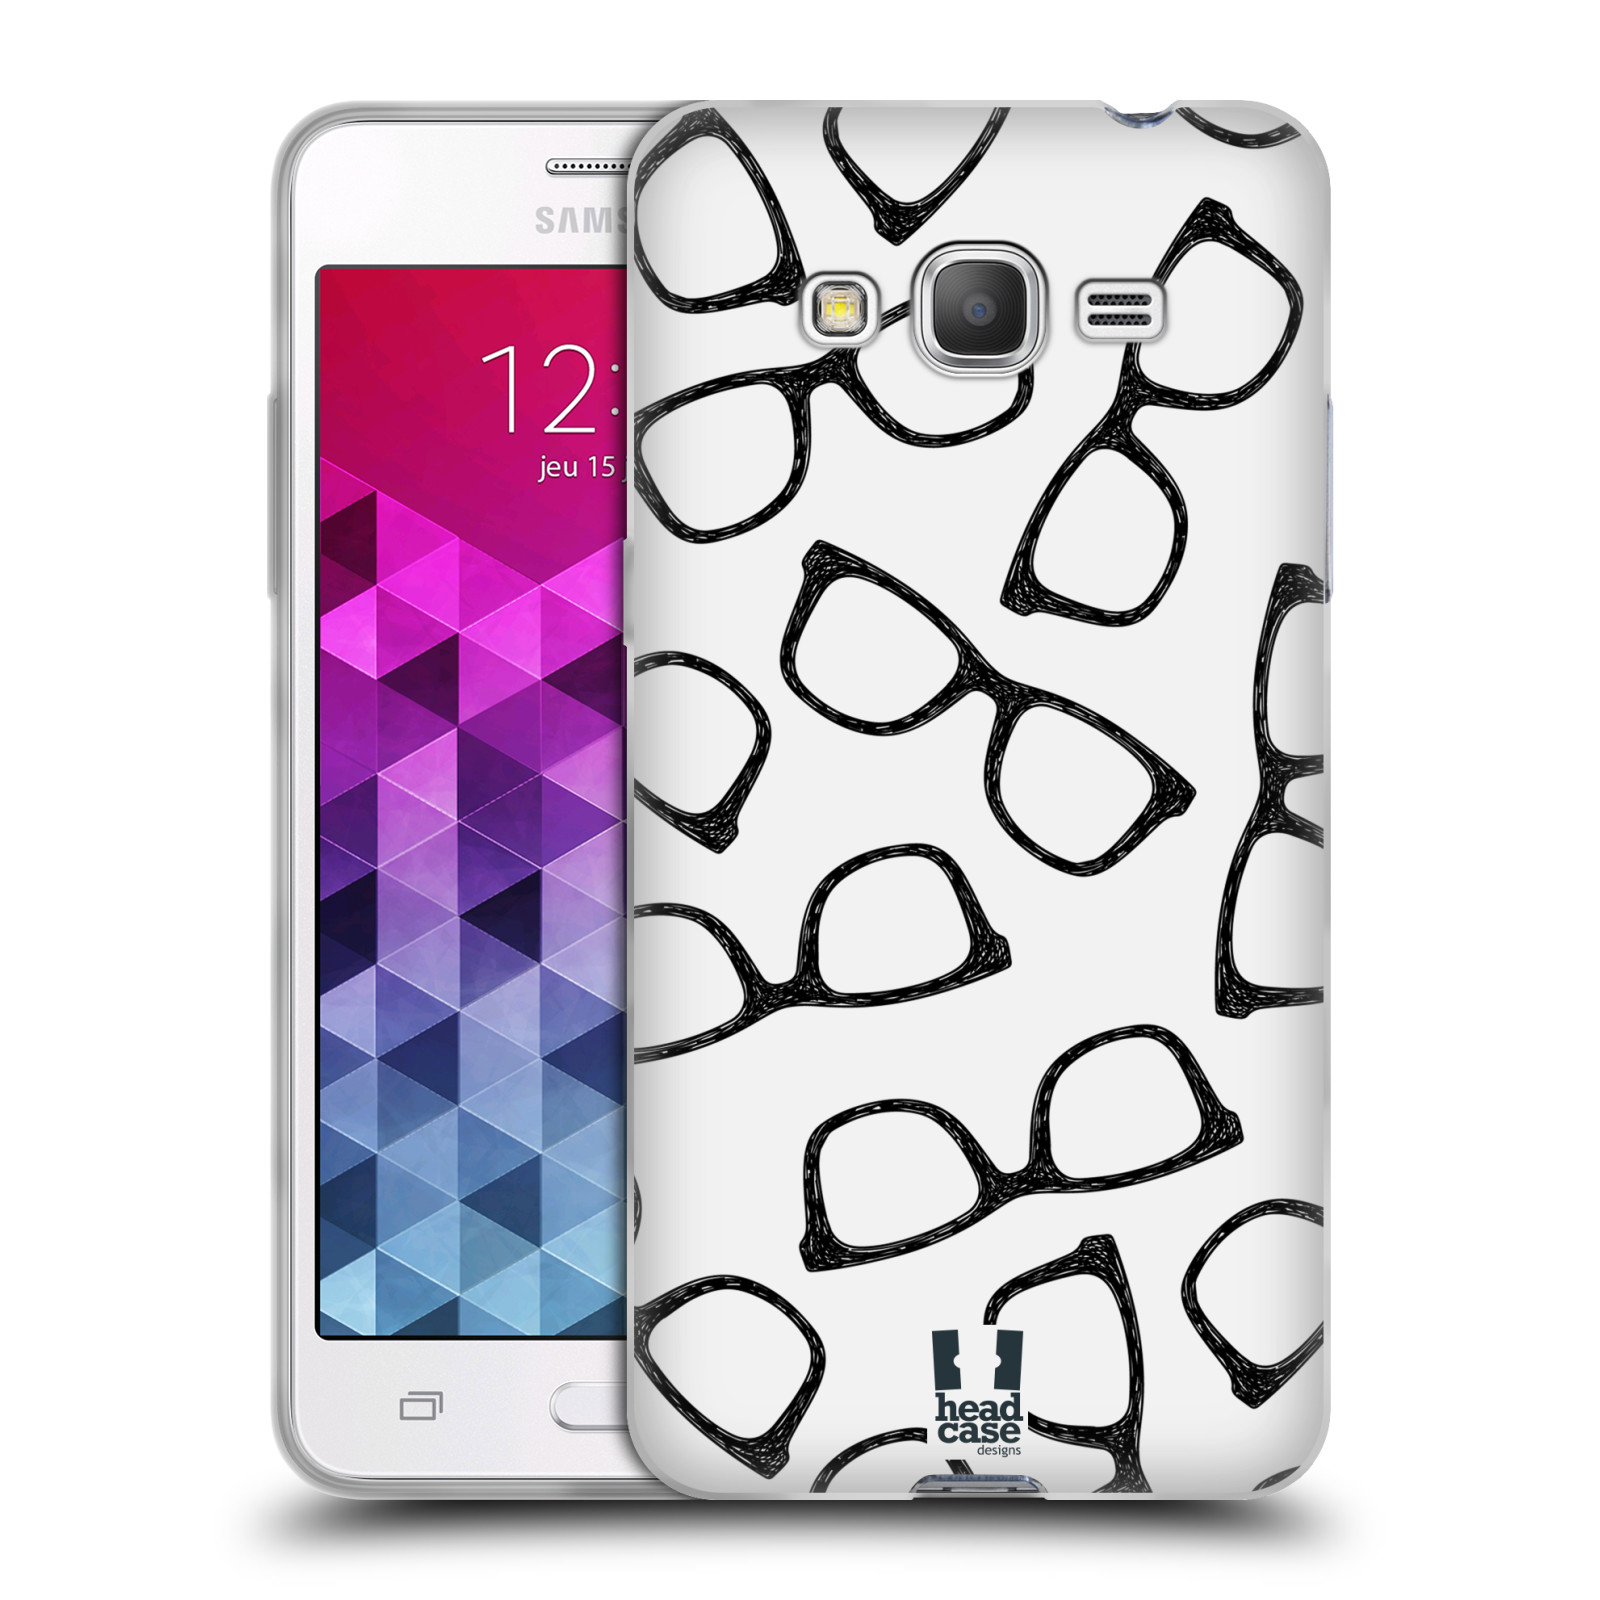 Silikonové pouzdro na mobil Samsung Galaxy Grand Prime VE HEAD CASE HIPSTER BRÝLE (Silikonový kryt či obal na mobilní telefon Samsung Galaxy Grand Prime VE SM-G531F)